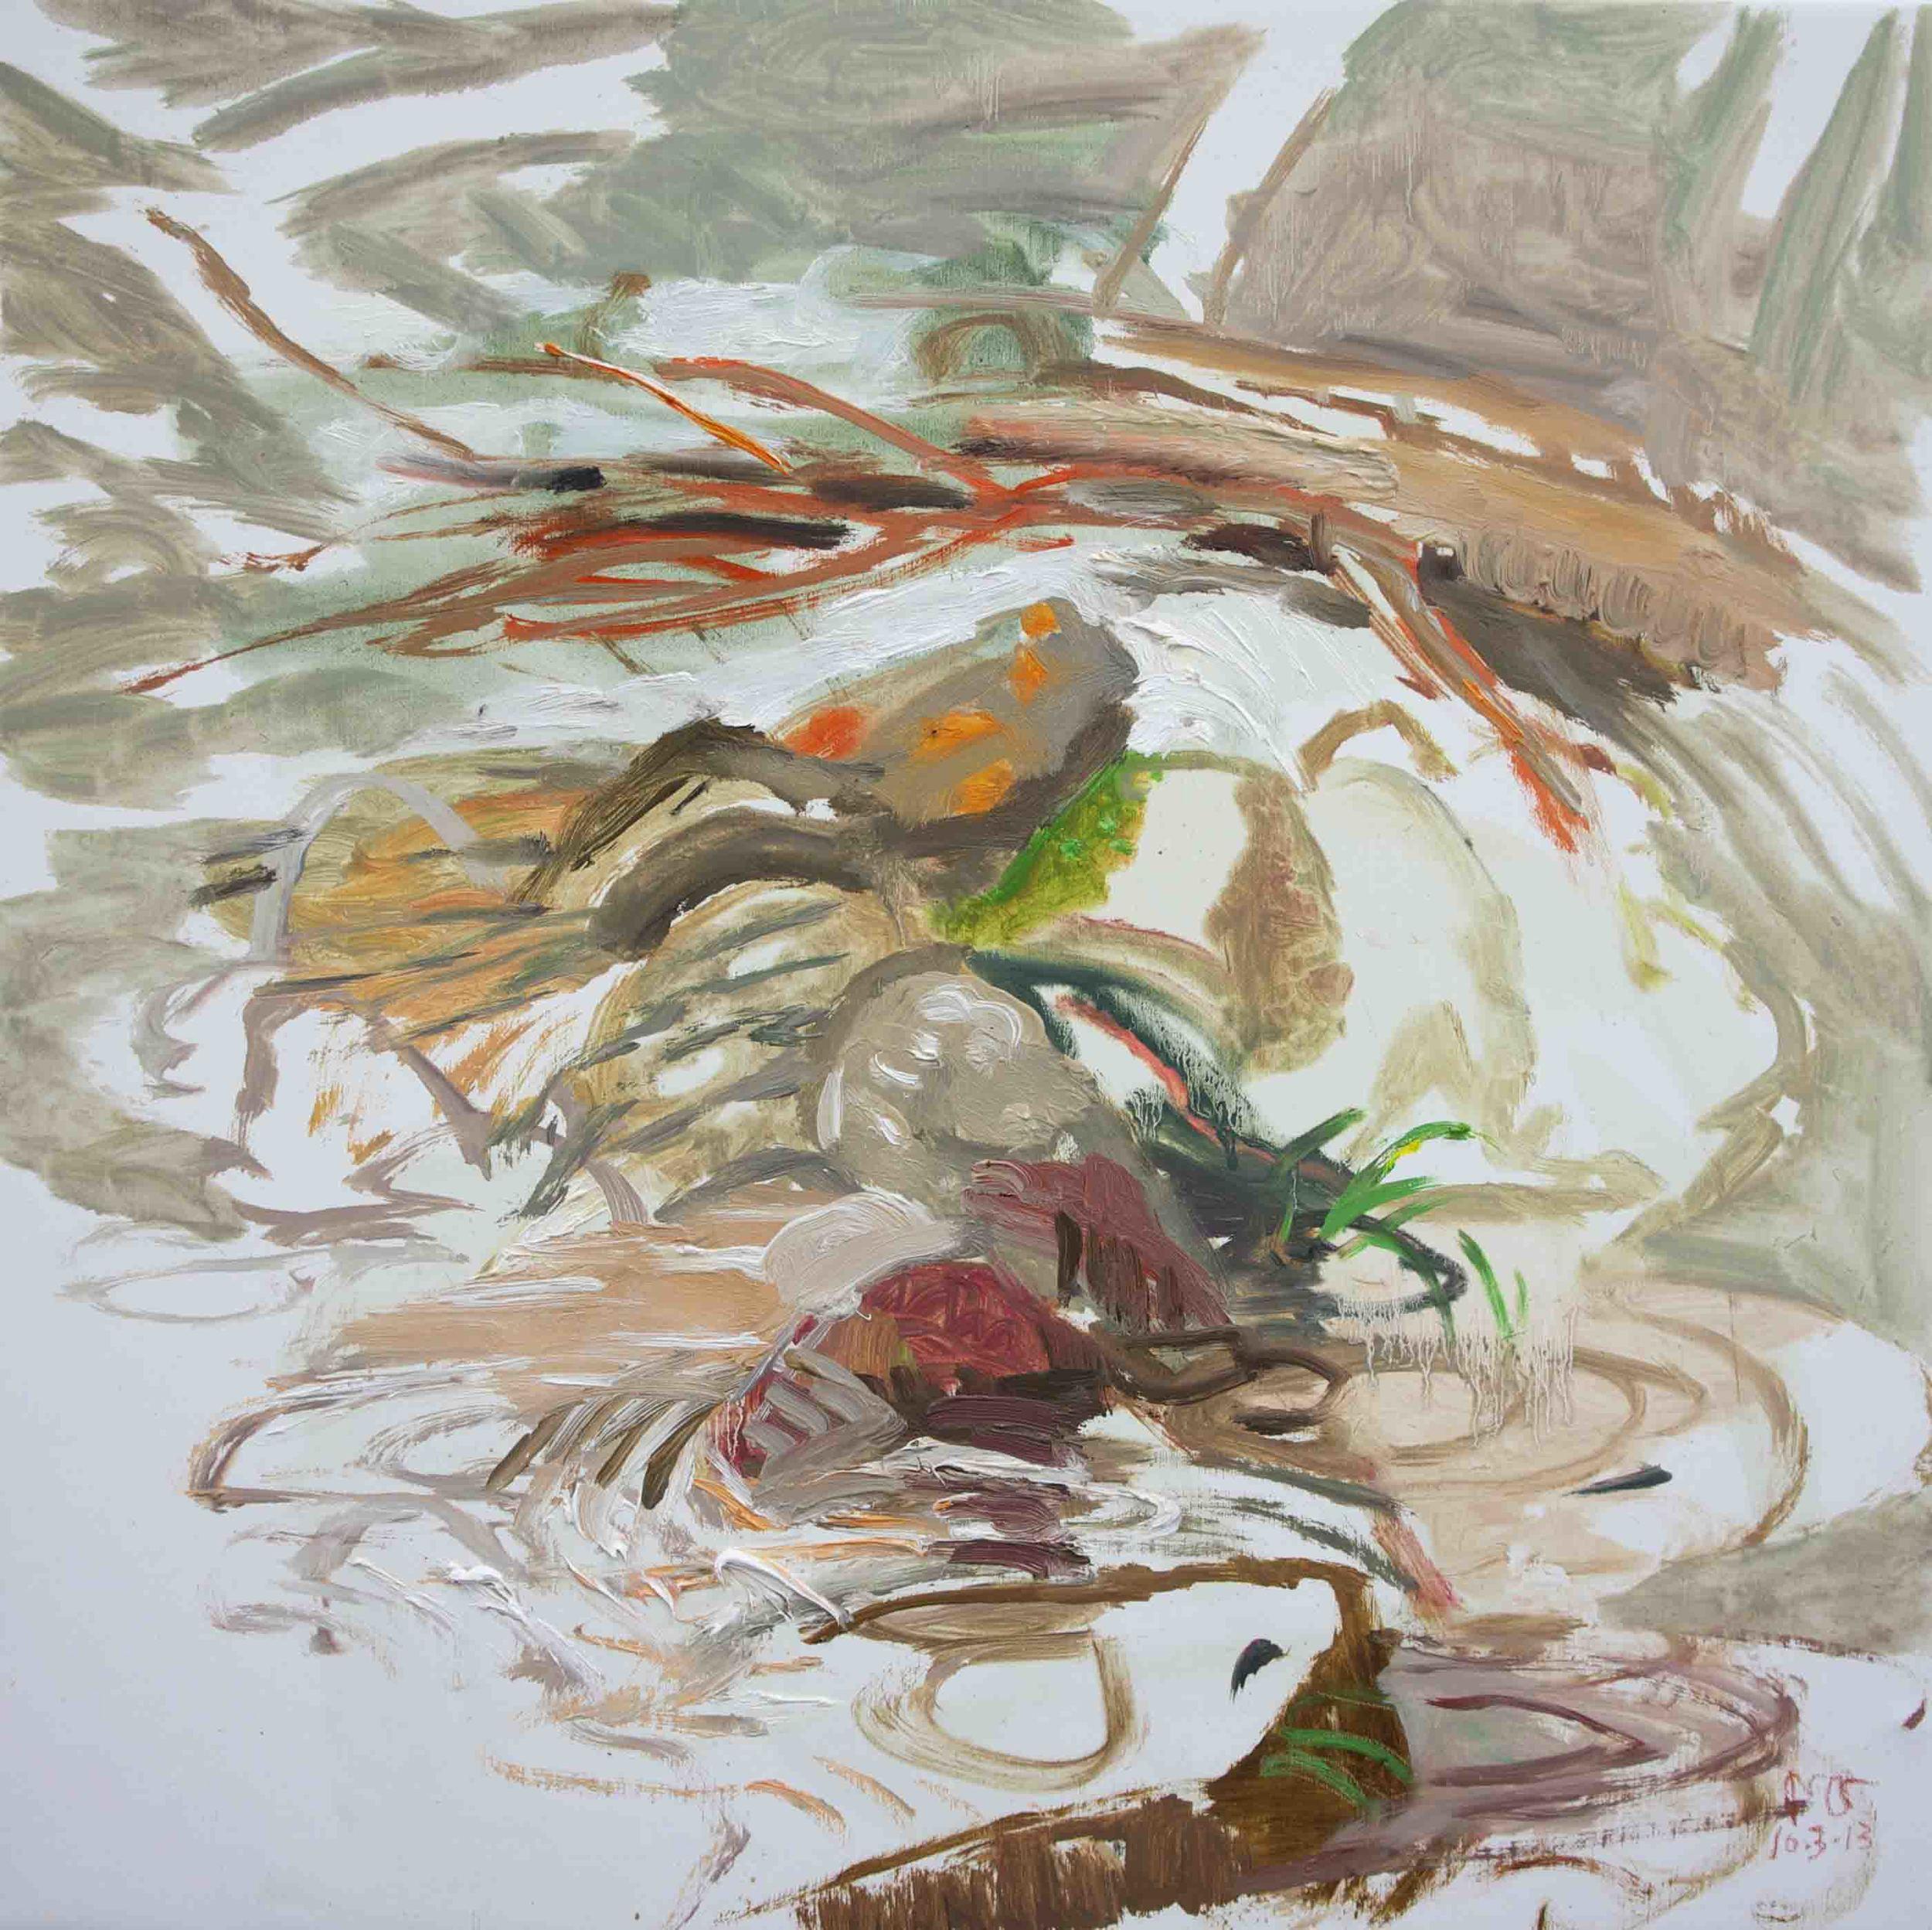 "10/3/13 n. crestone creek  16x16"" oil on linen"